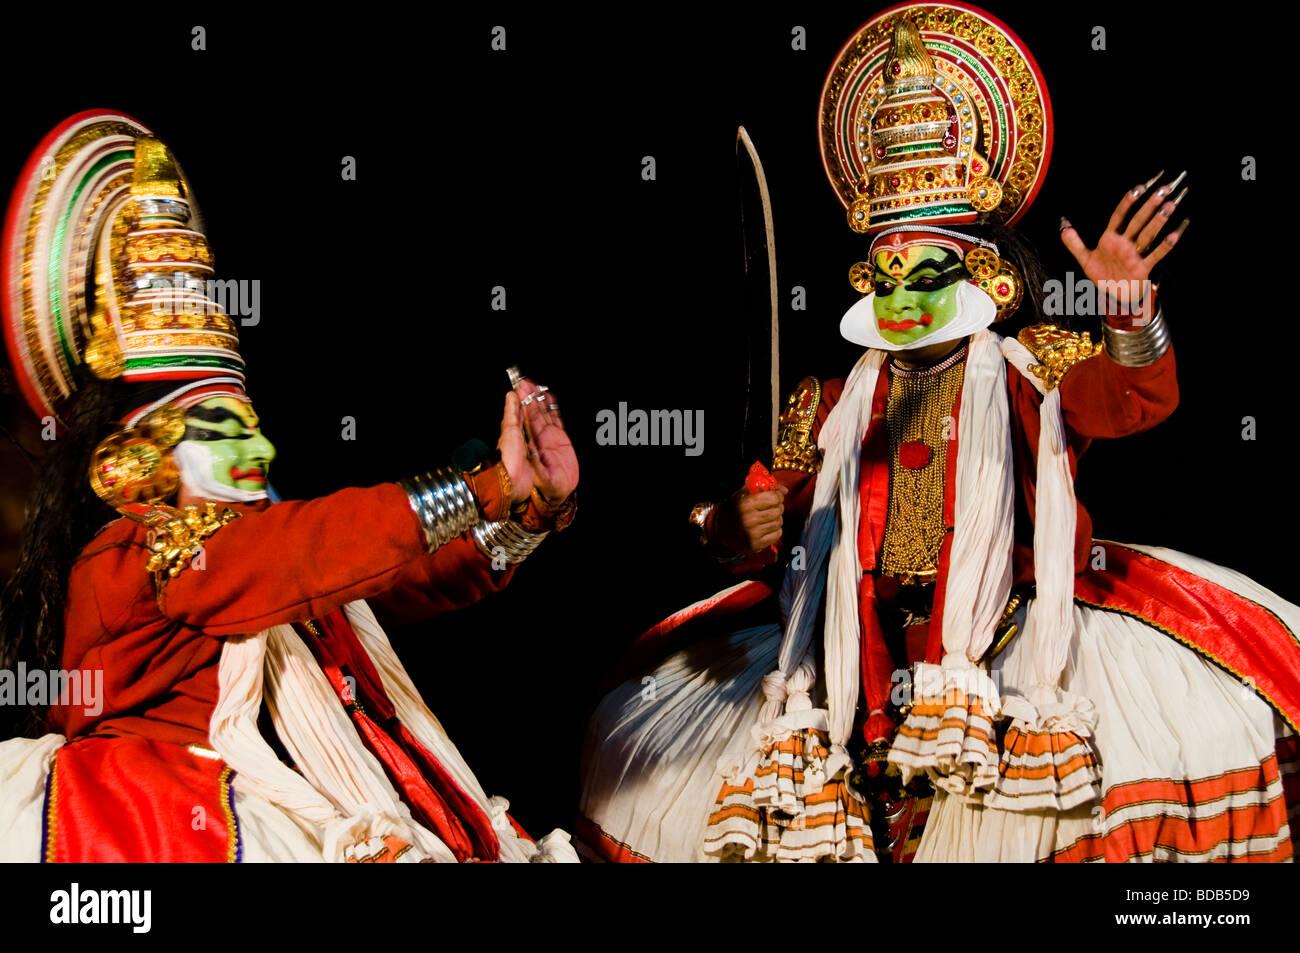 bunraku theater and kathakali dance drama Drums and drama: mask dance from sri lanka (touring production)  bunraku puppet theater of japan 1983-84  kathakali & ethel winter dance.